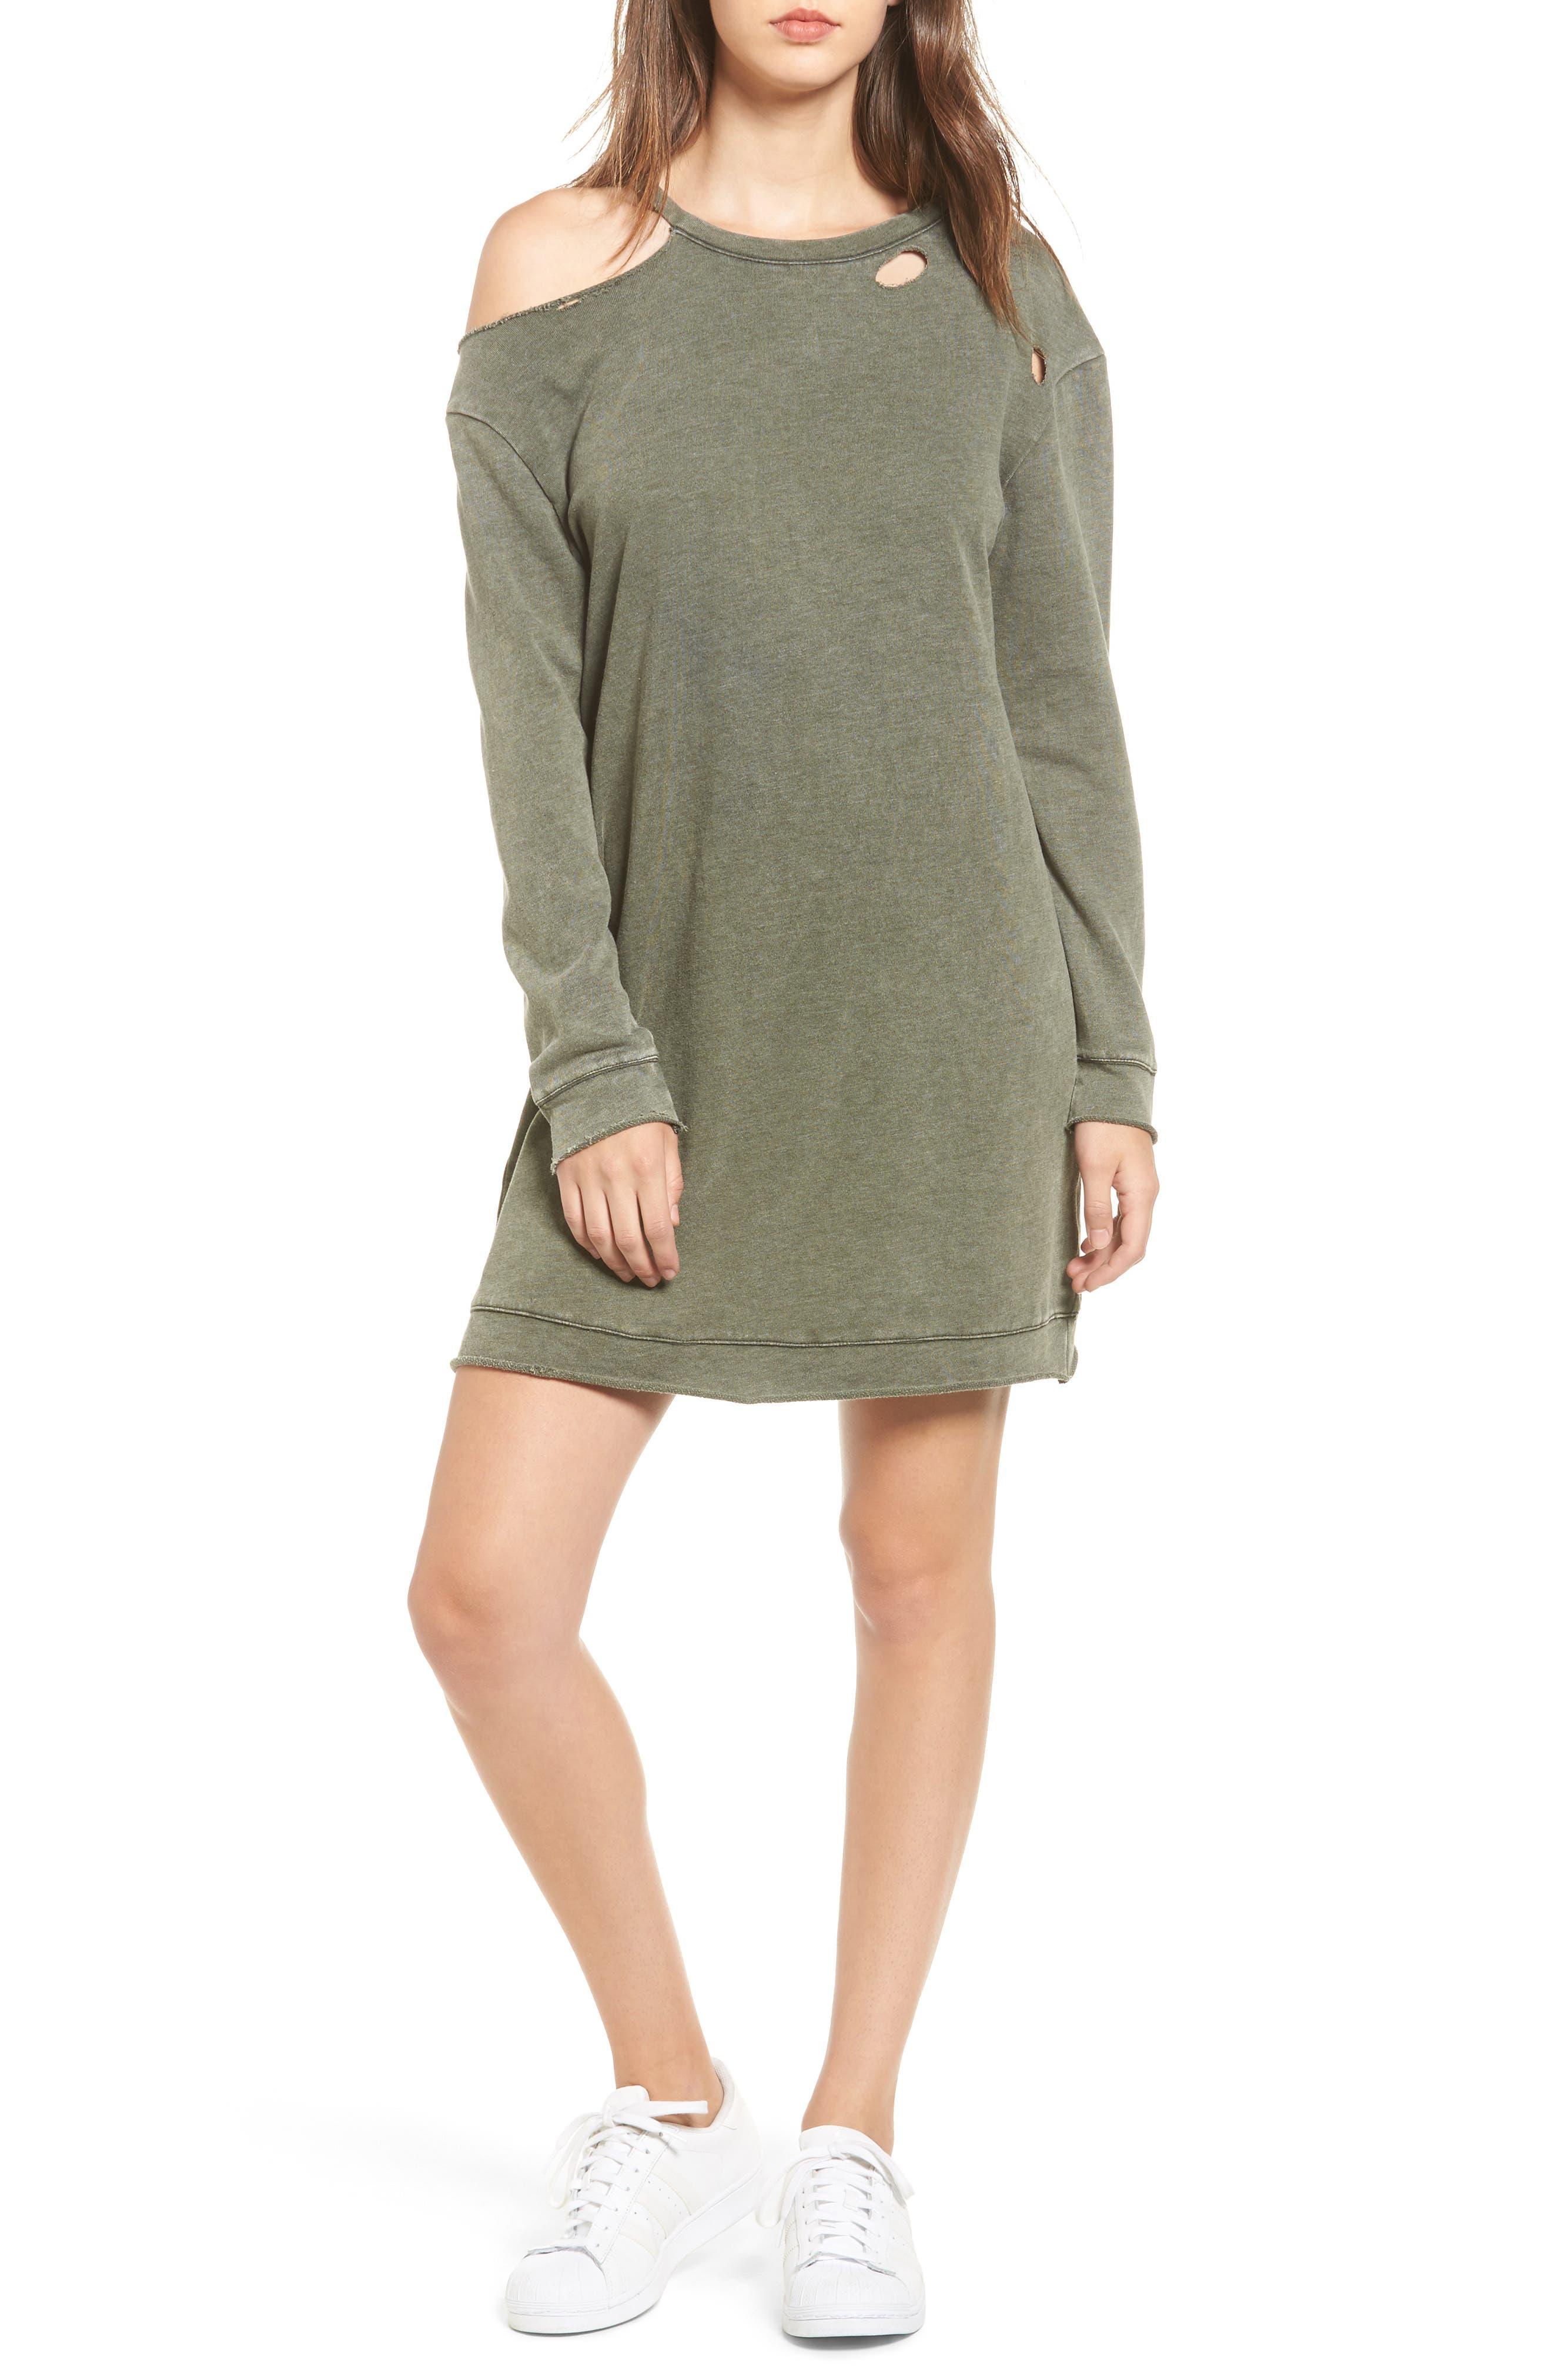 Ripped Sweatshirt Dress,                         Main,                         color, Olive Dark